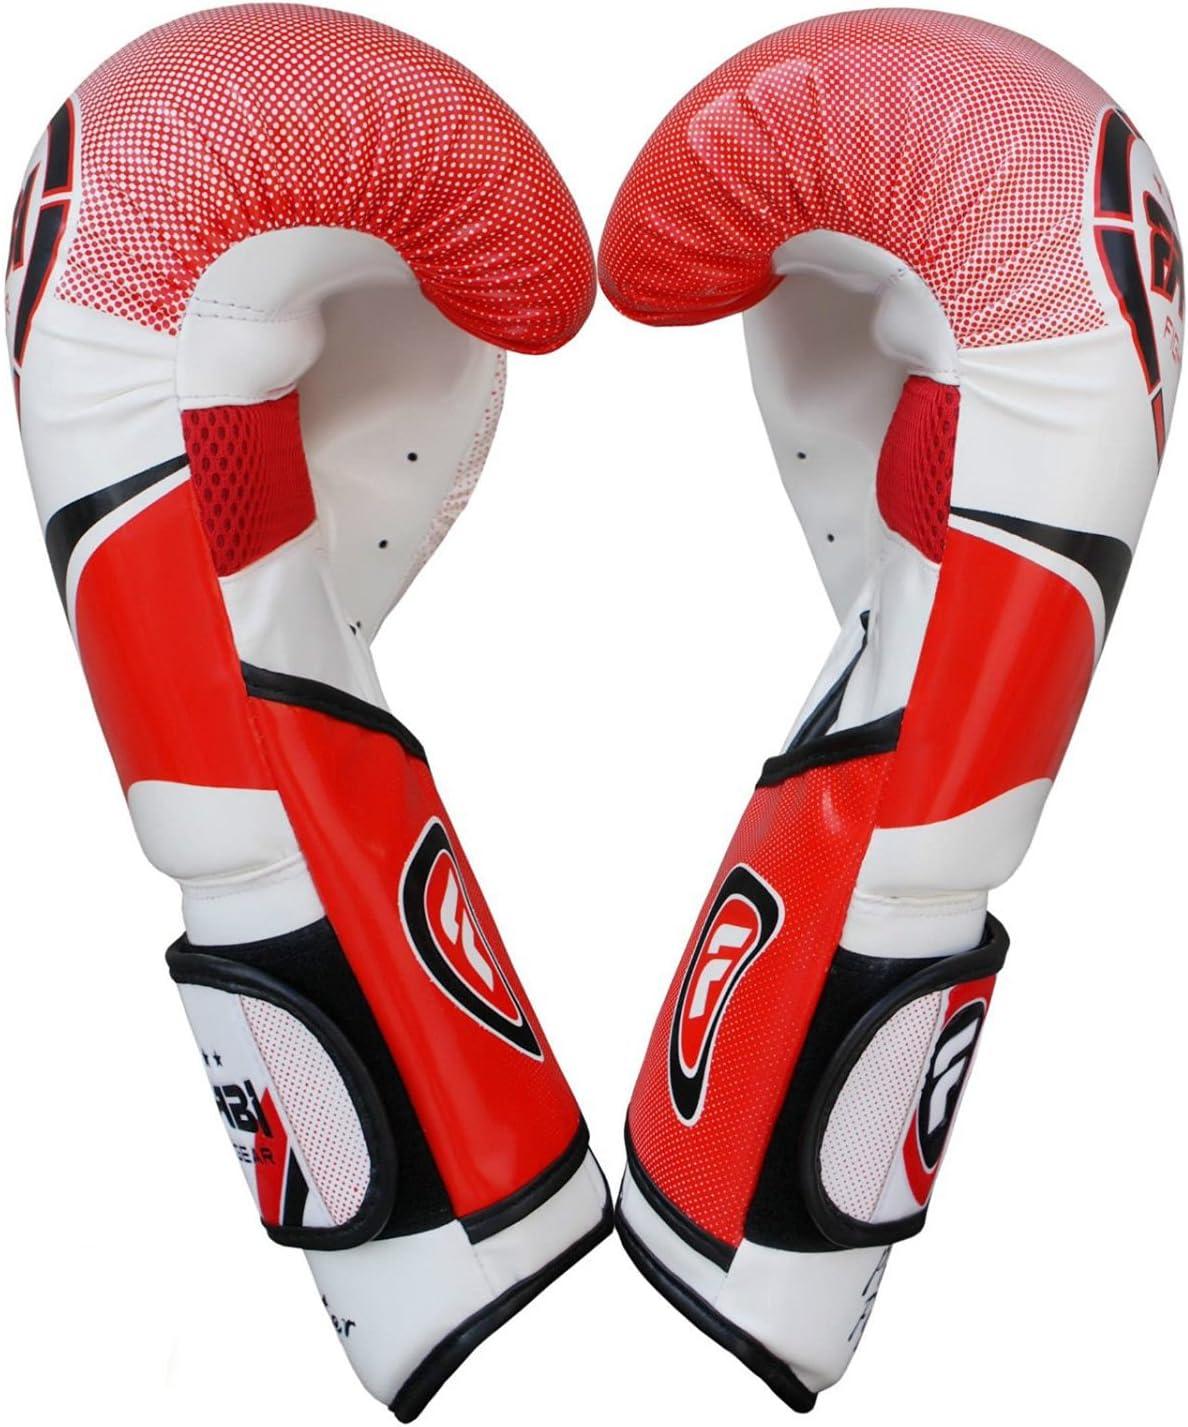 Farabi Boxing Gloves Training Sparring Punching Bag Focus Pads Training Gloves Pair 8-oz 10-oz 12-oz 14-oz 16oz